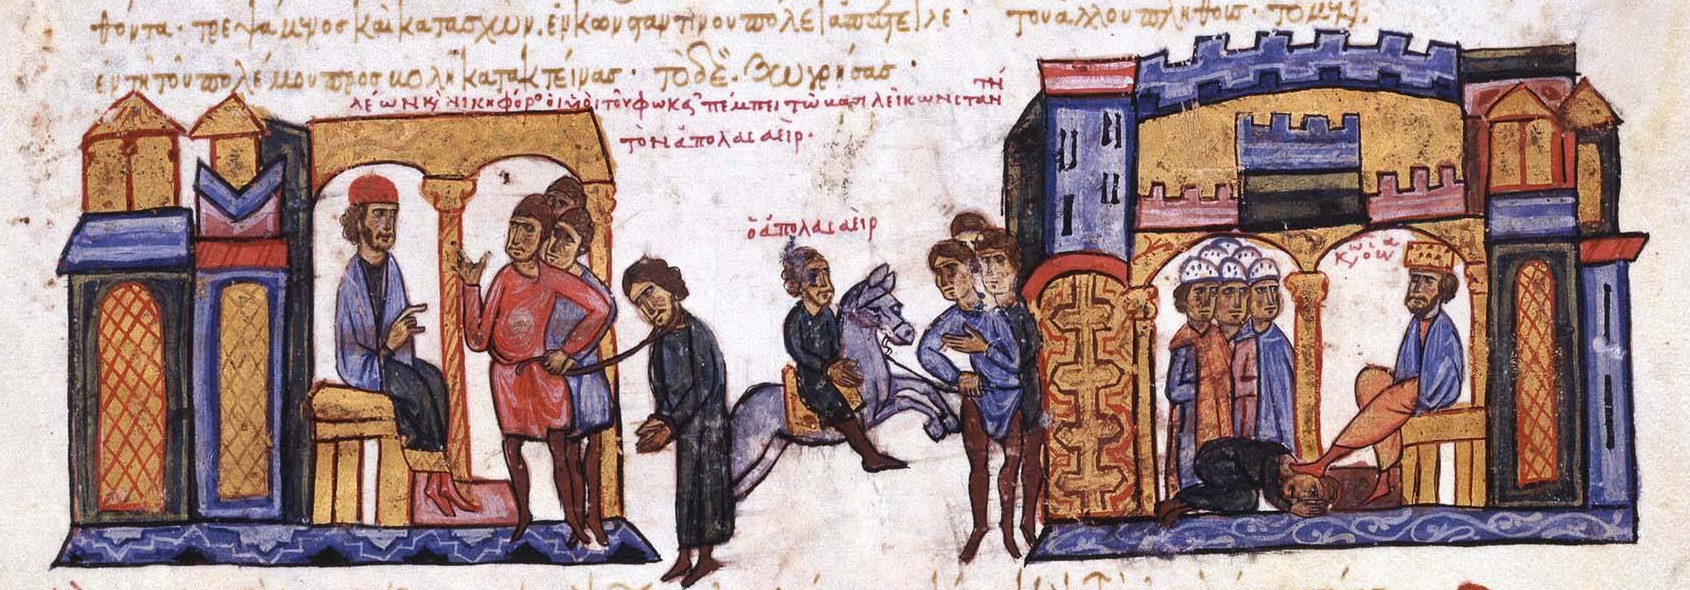 Leo_Phokas_sents_the_captive_Arab_general_Apolasaeir_to_Constantinople